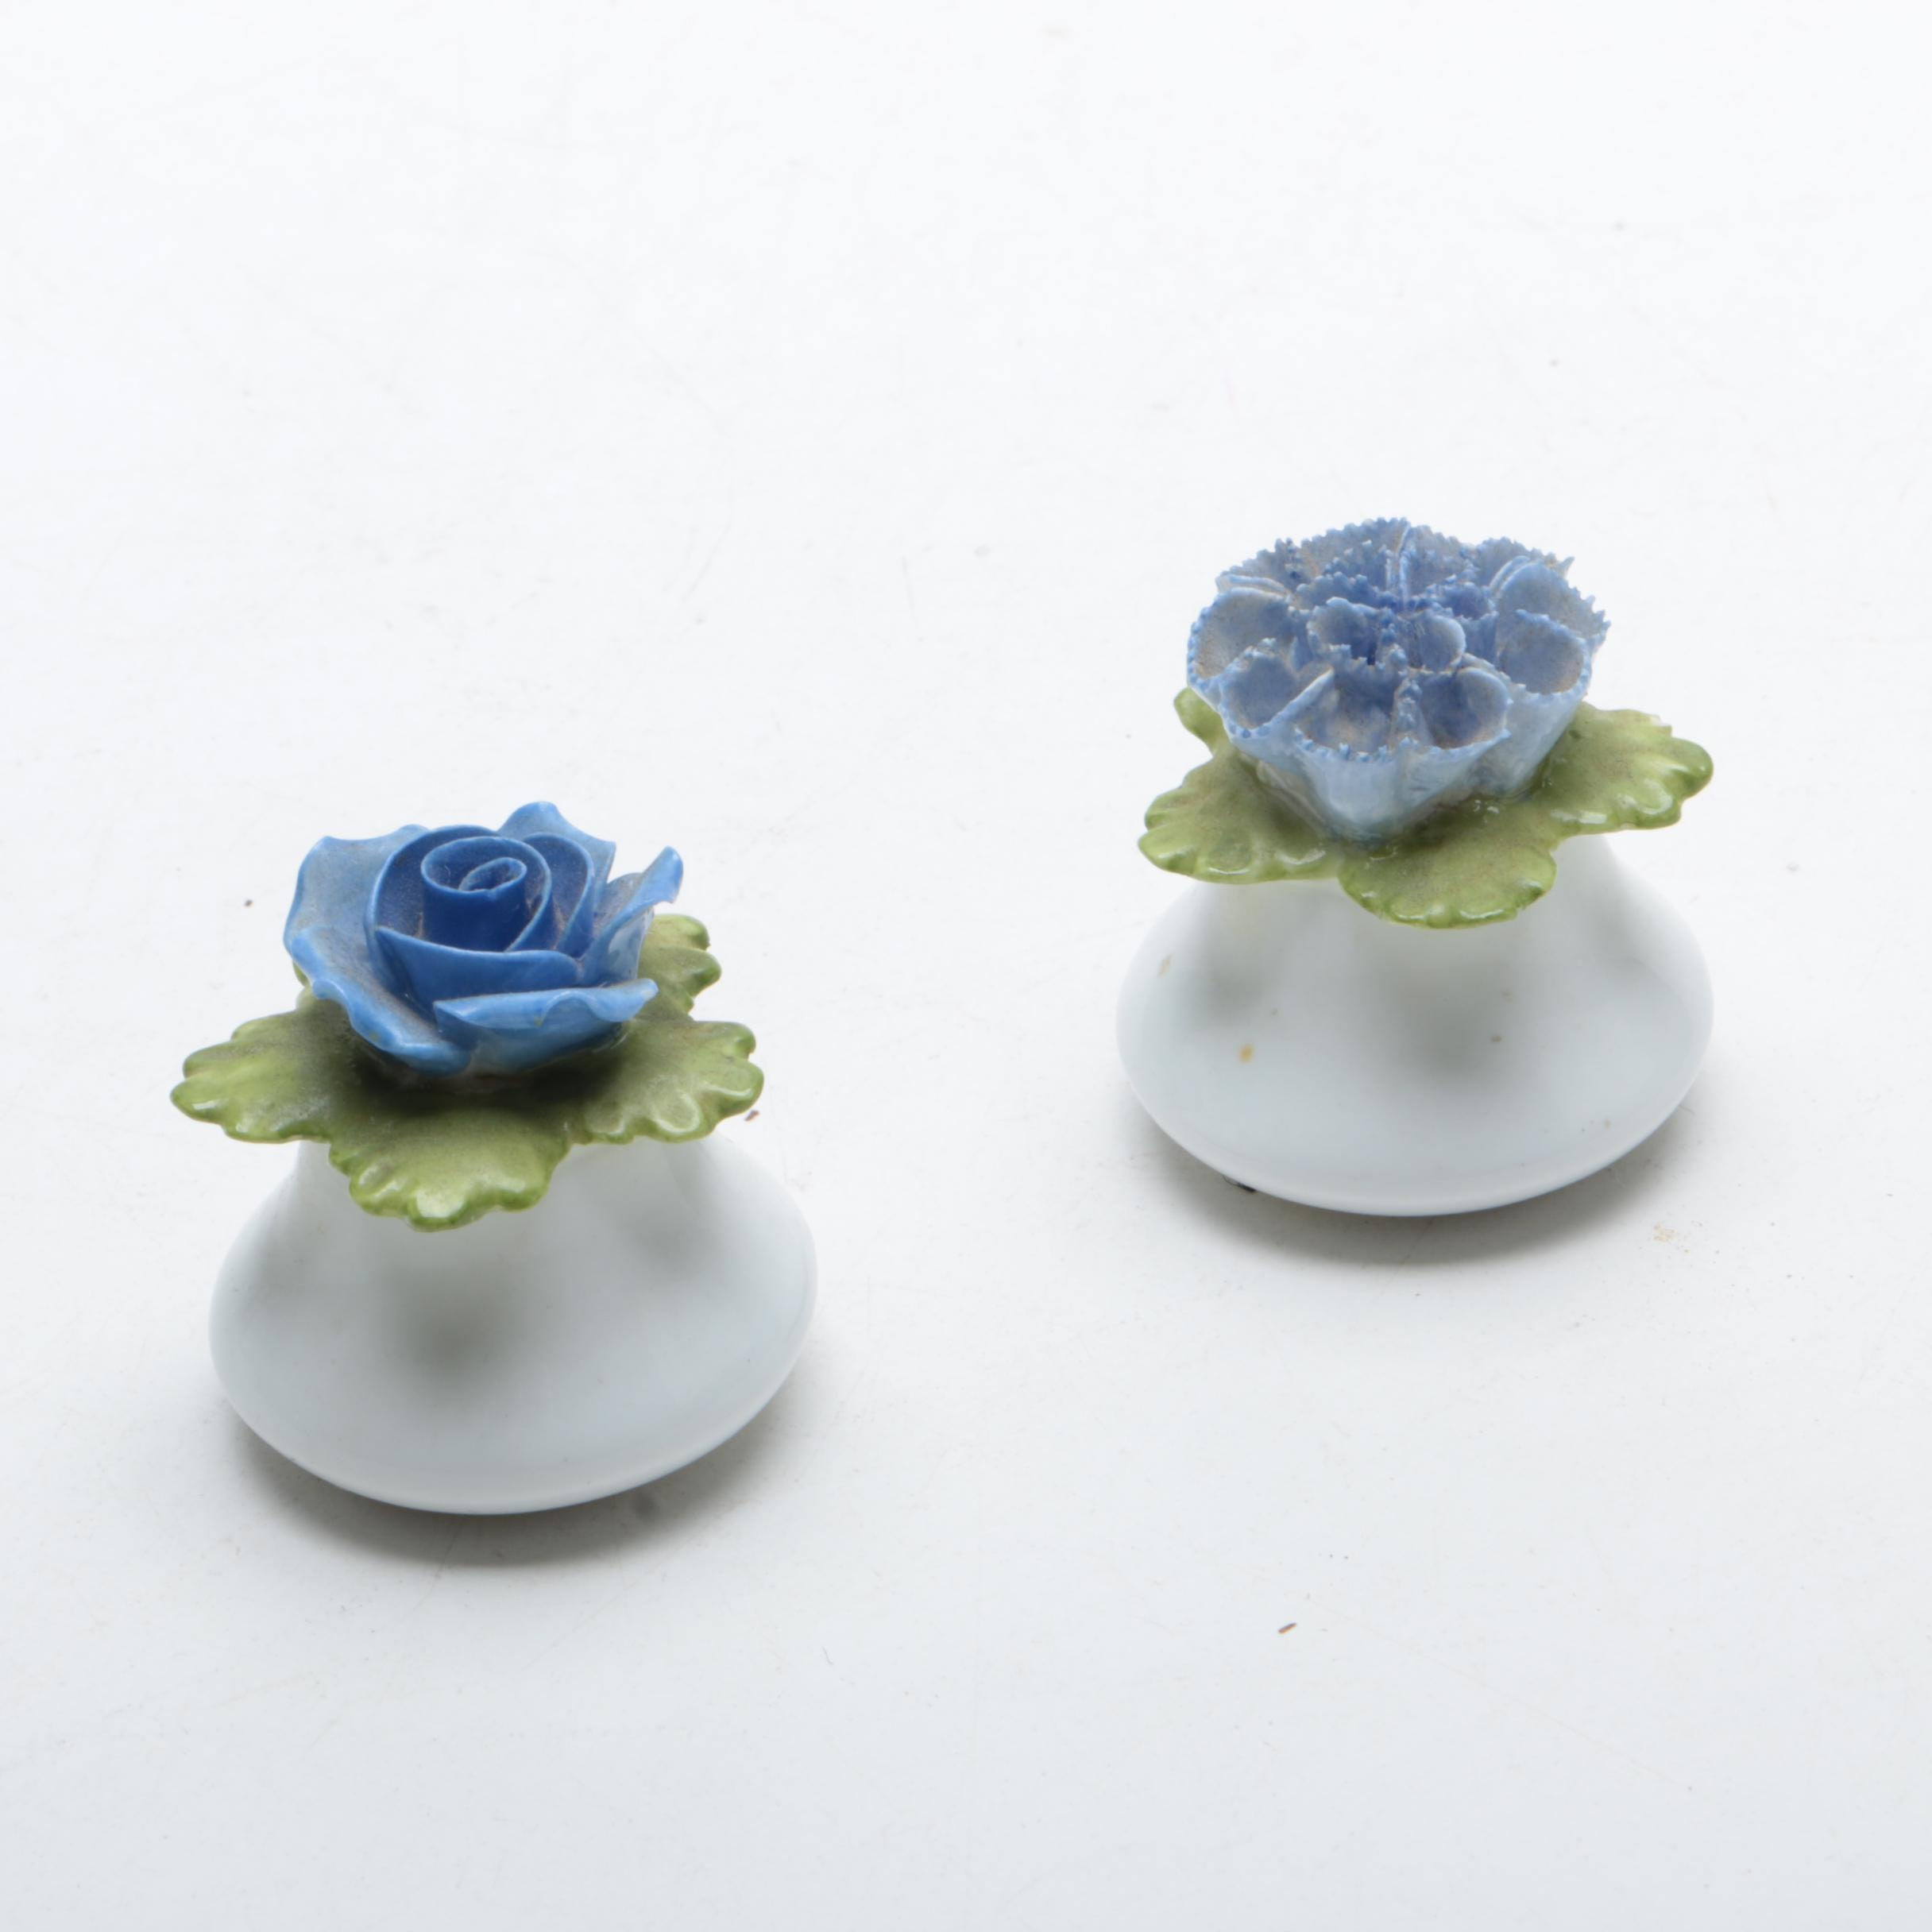 English Porcelain Floral Relief Condiment Shakers